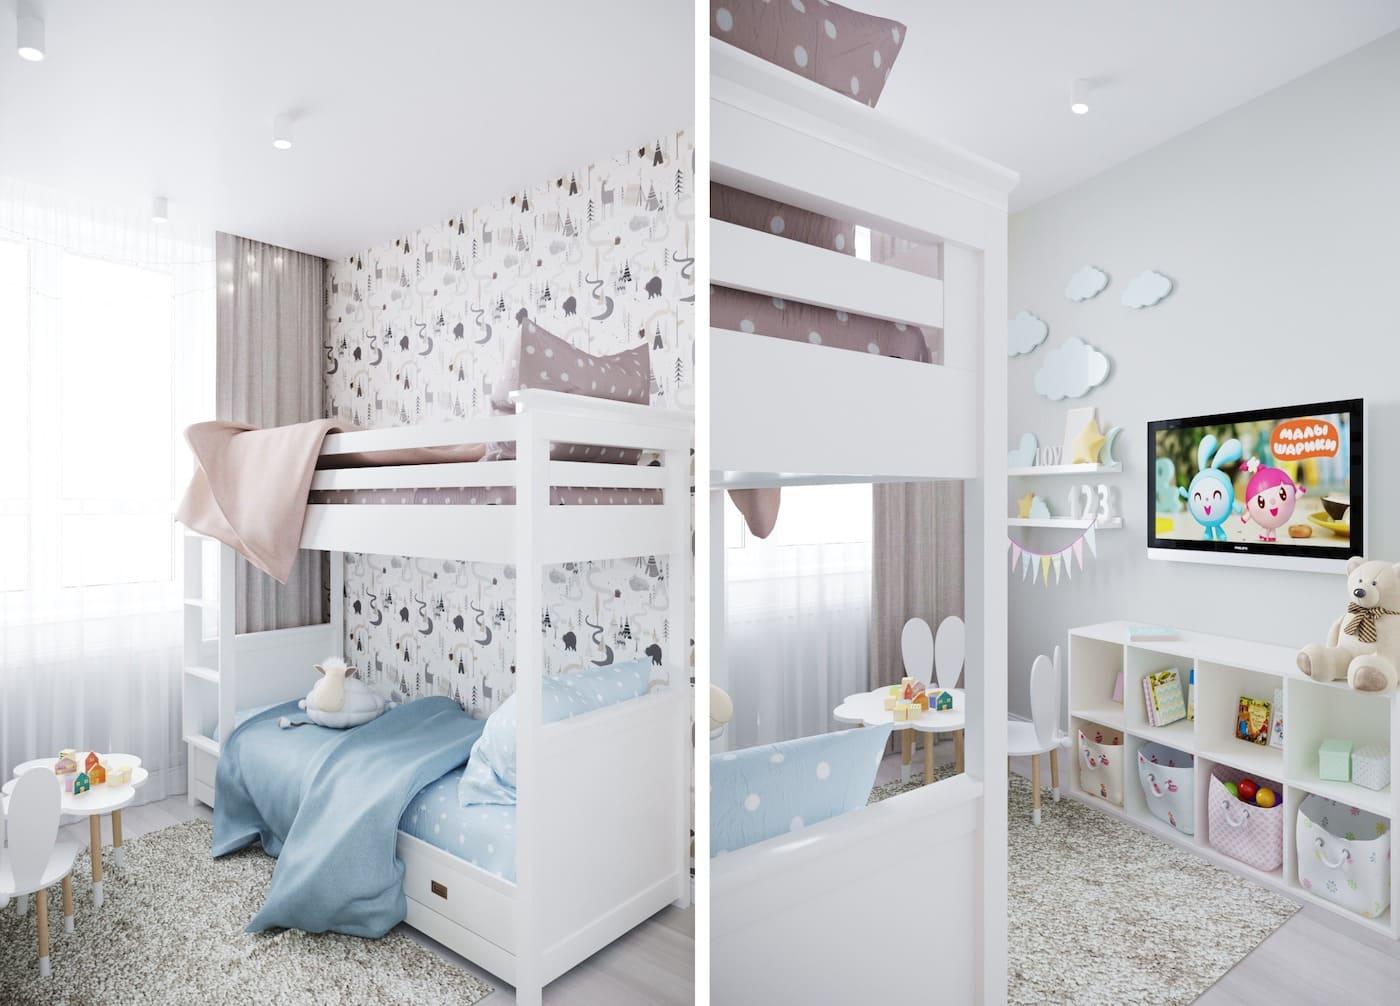 интерьер детской комнаты фото 8